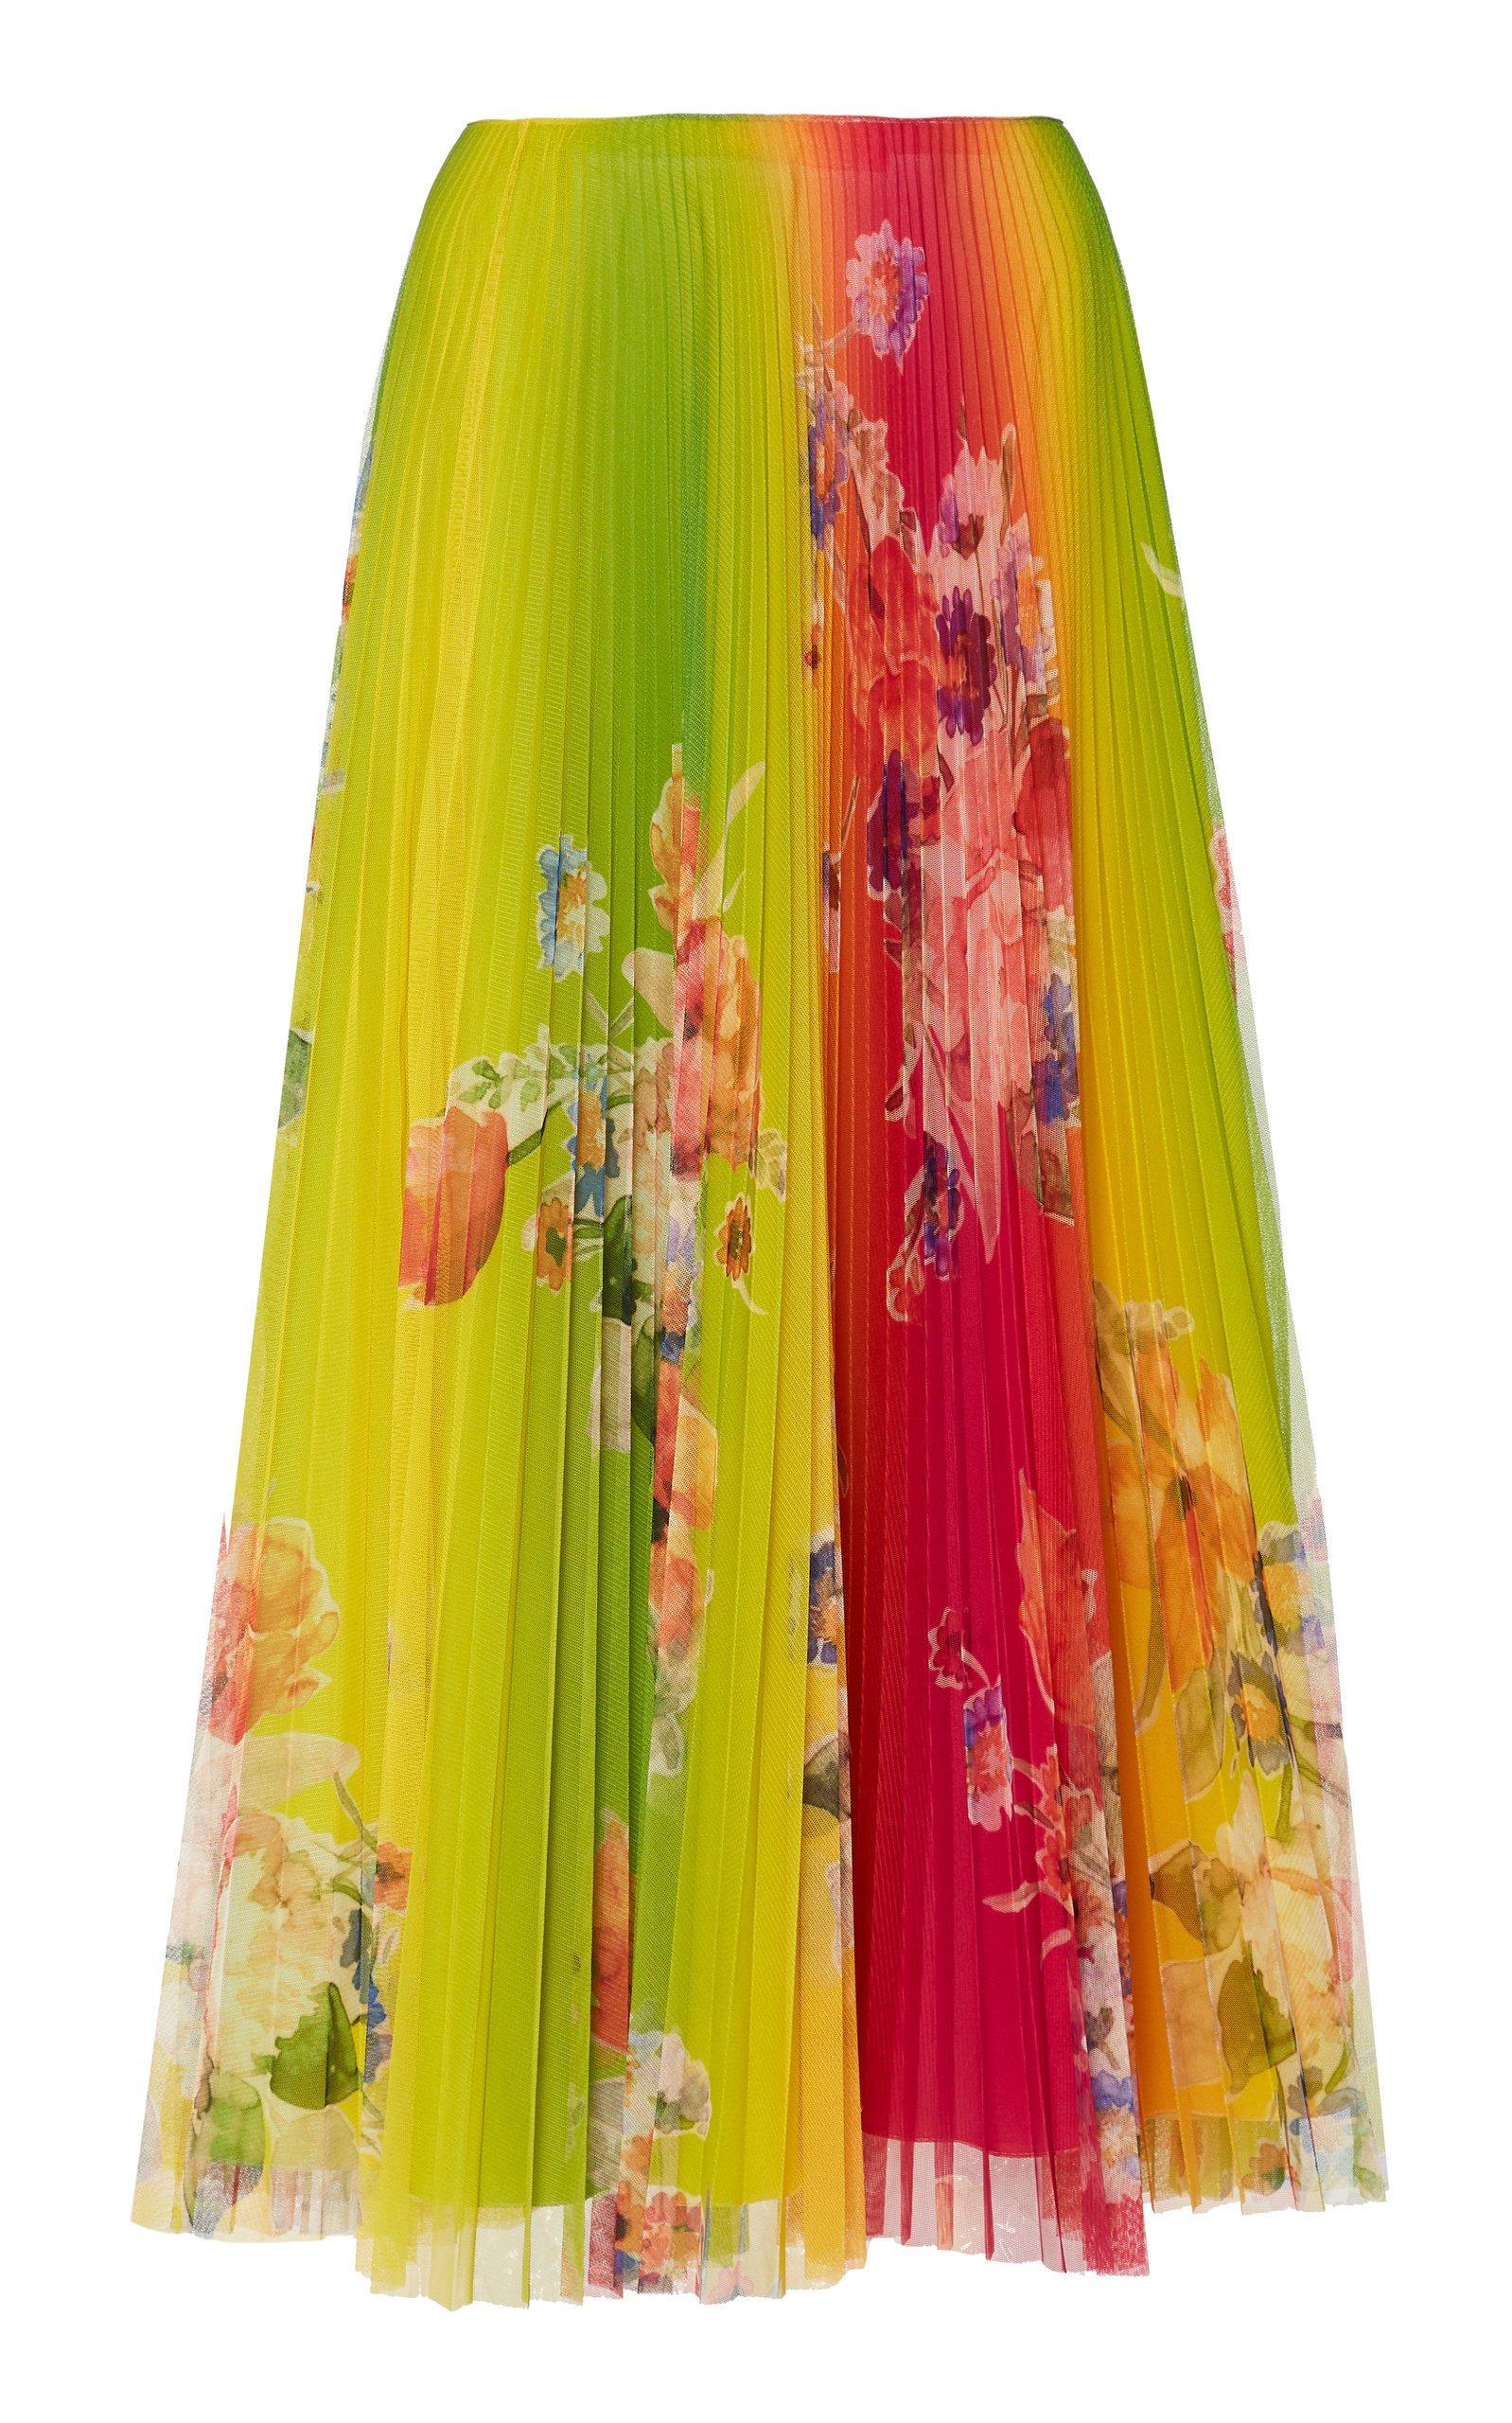 Ralph Lauren Pleated Trivelas Skirt